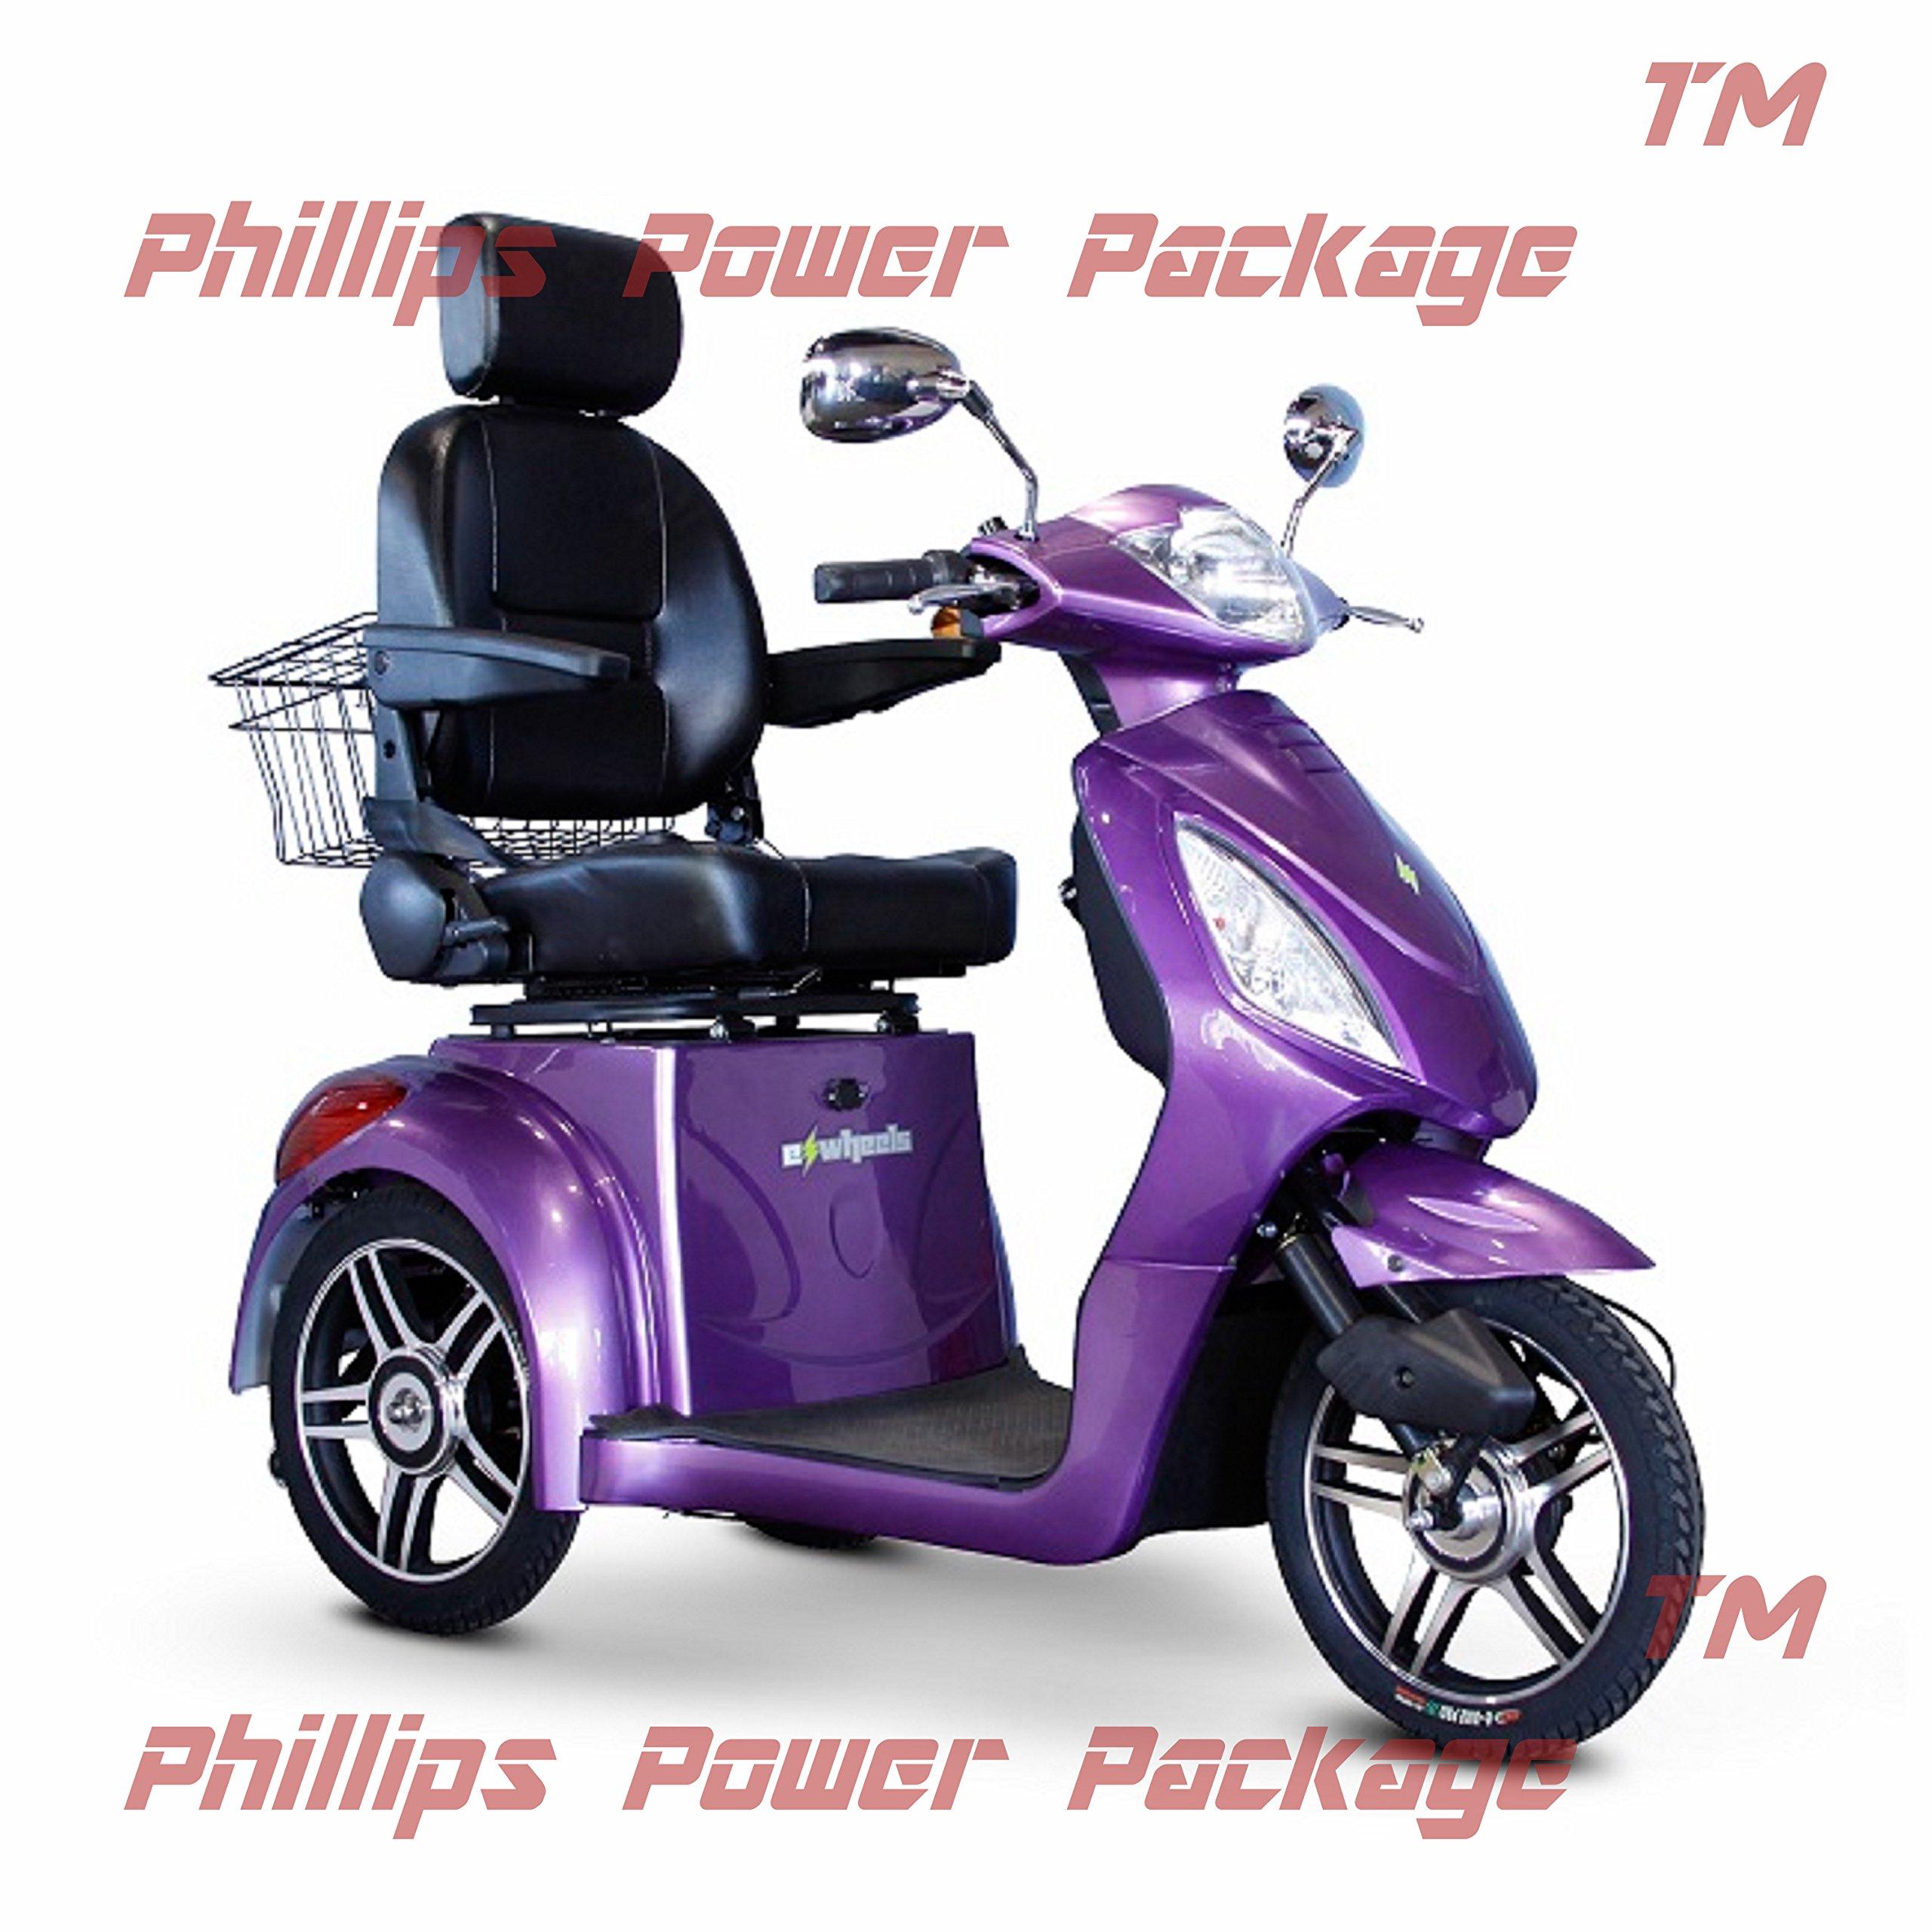 E-Wheels - EW-36 Full-Sized Scooter - 3-Wheel - Purple - PHILLIPS POWER PACKAGE TM - TO $500 VALUE